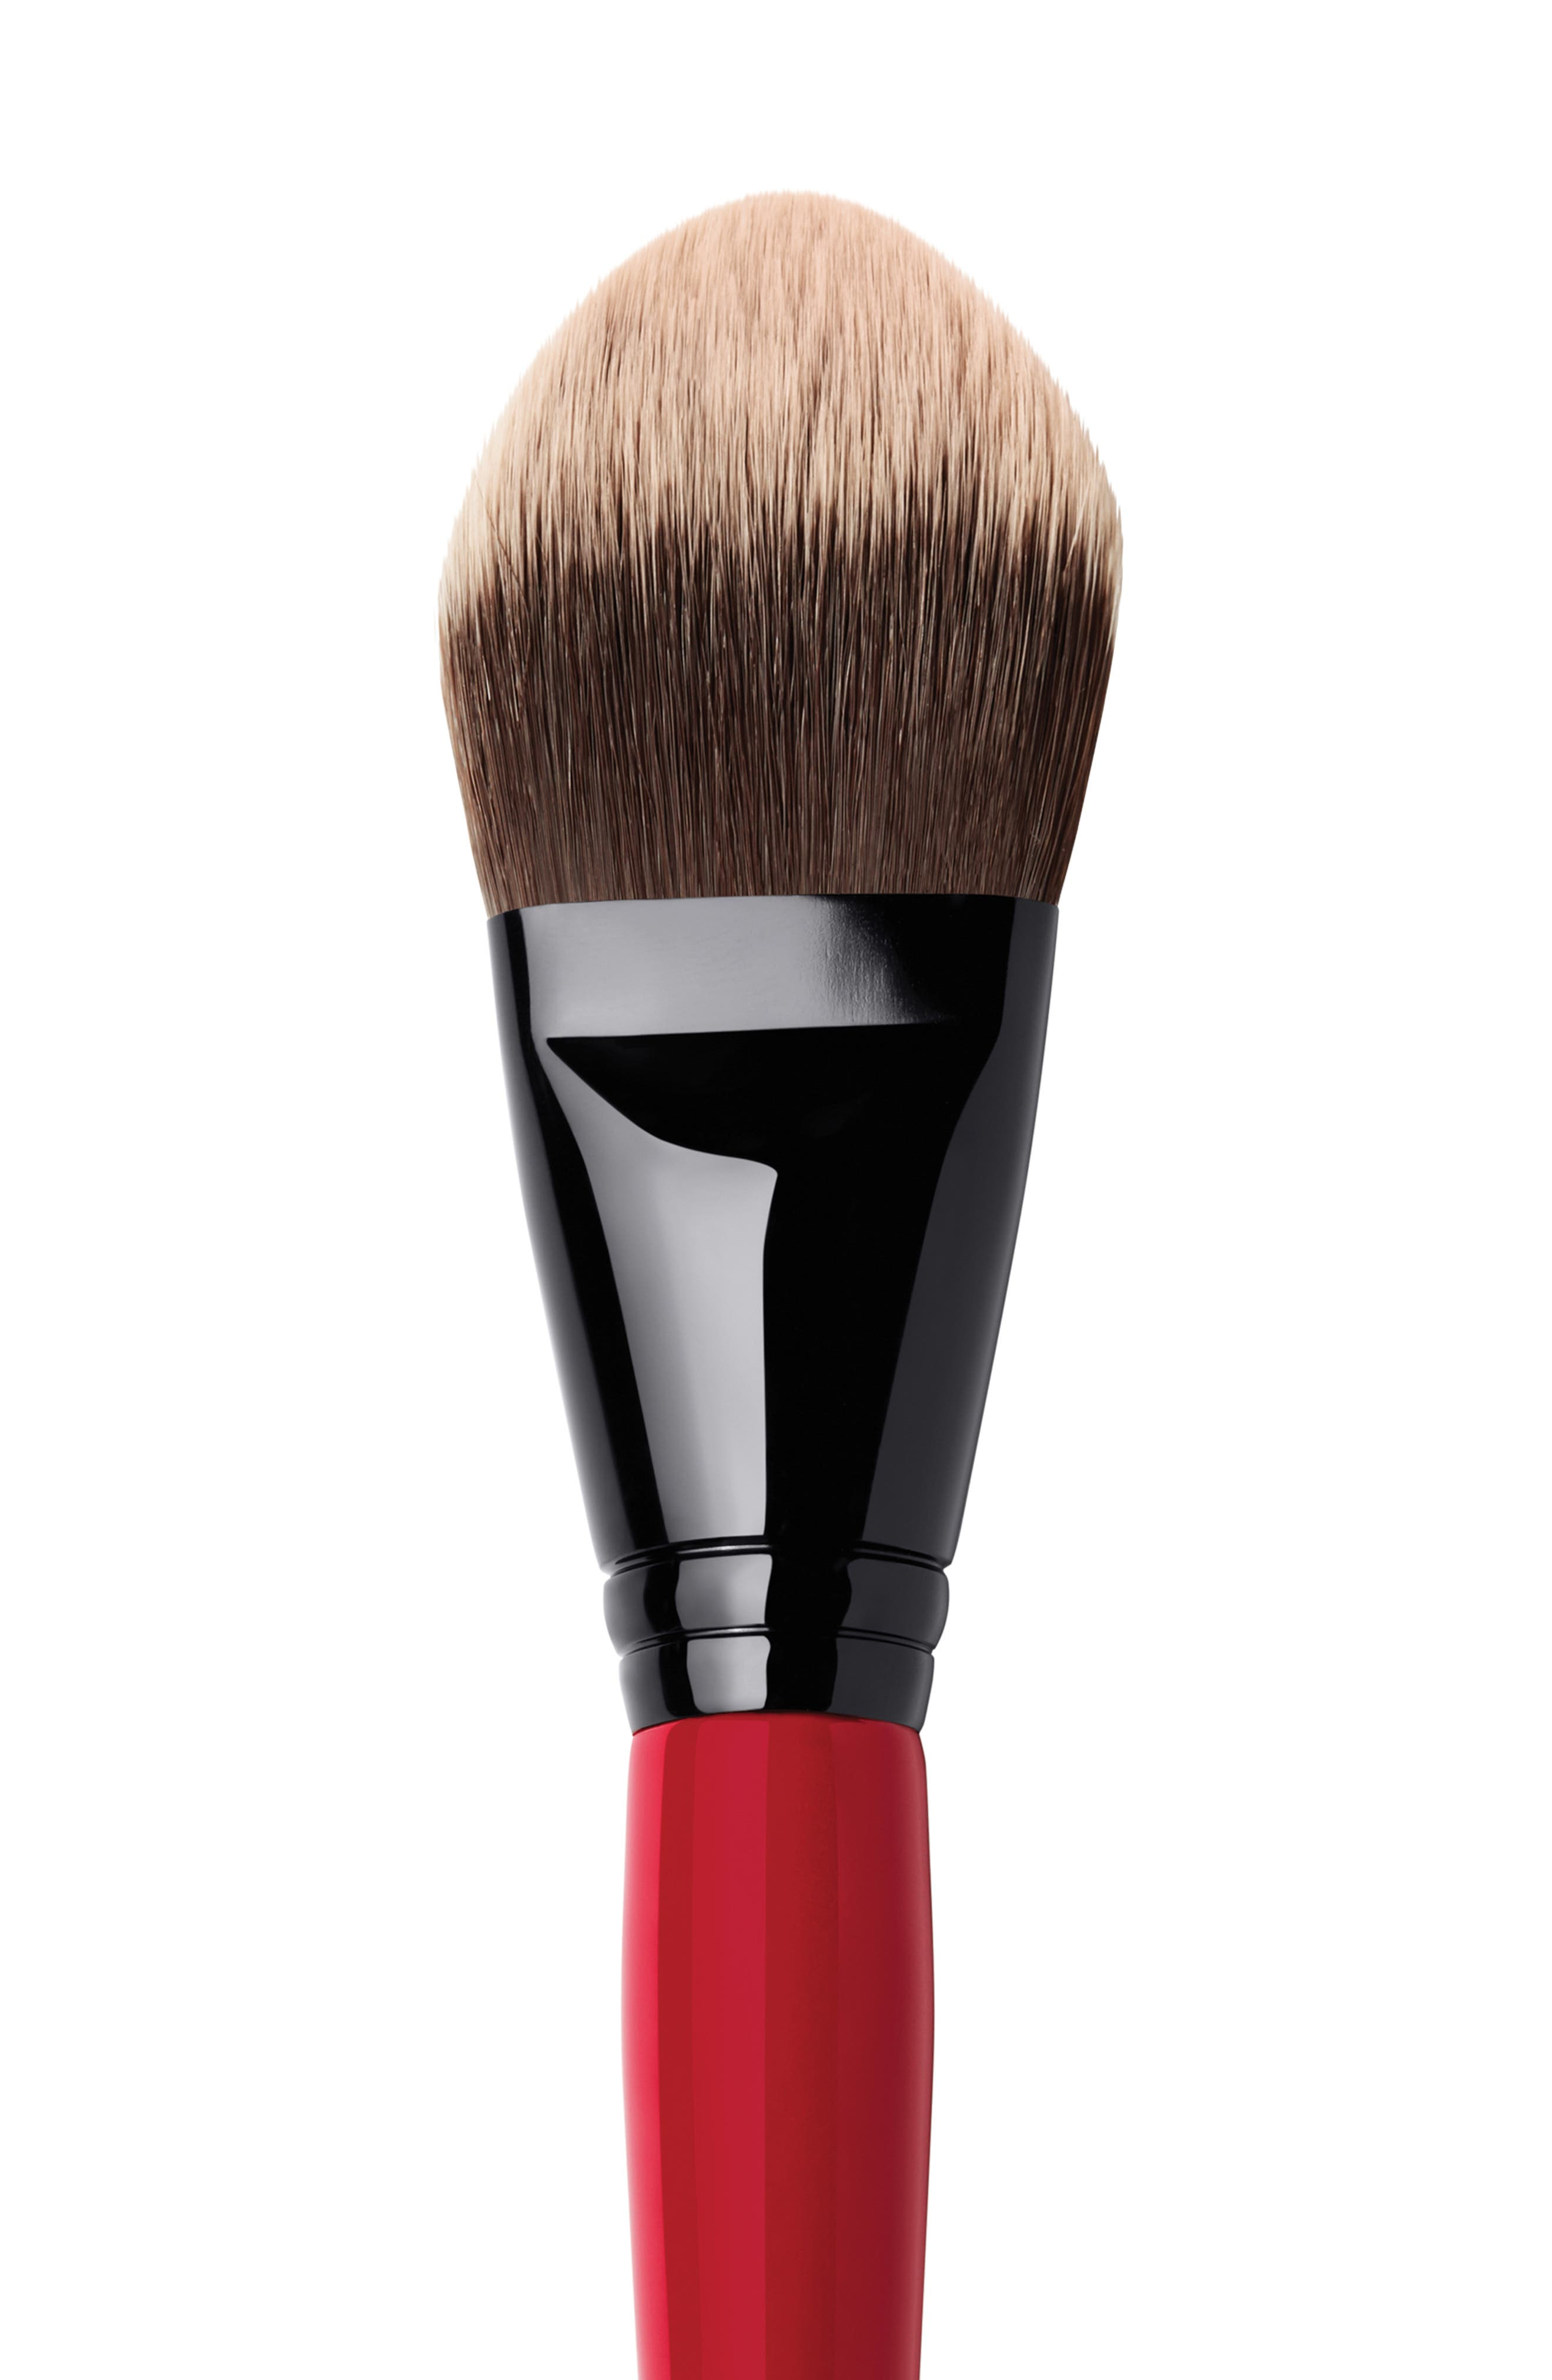 Sheer Foundation Brush,                             Alternate thumbnail 3, color,                             NO COLOR